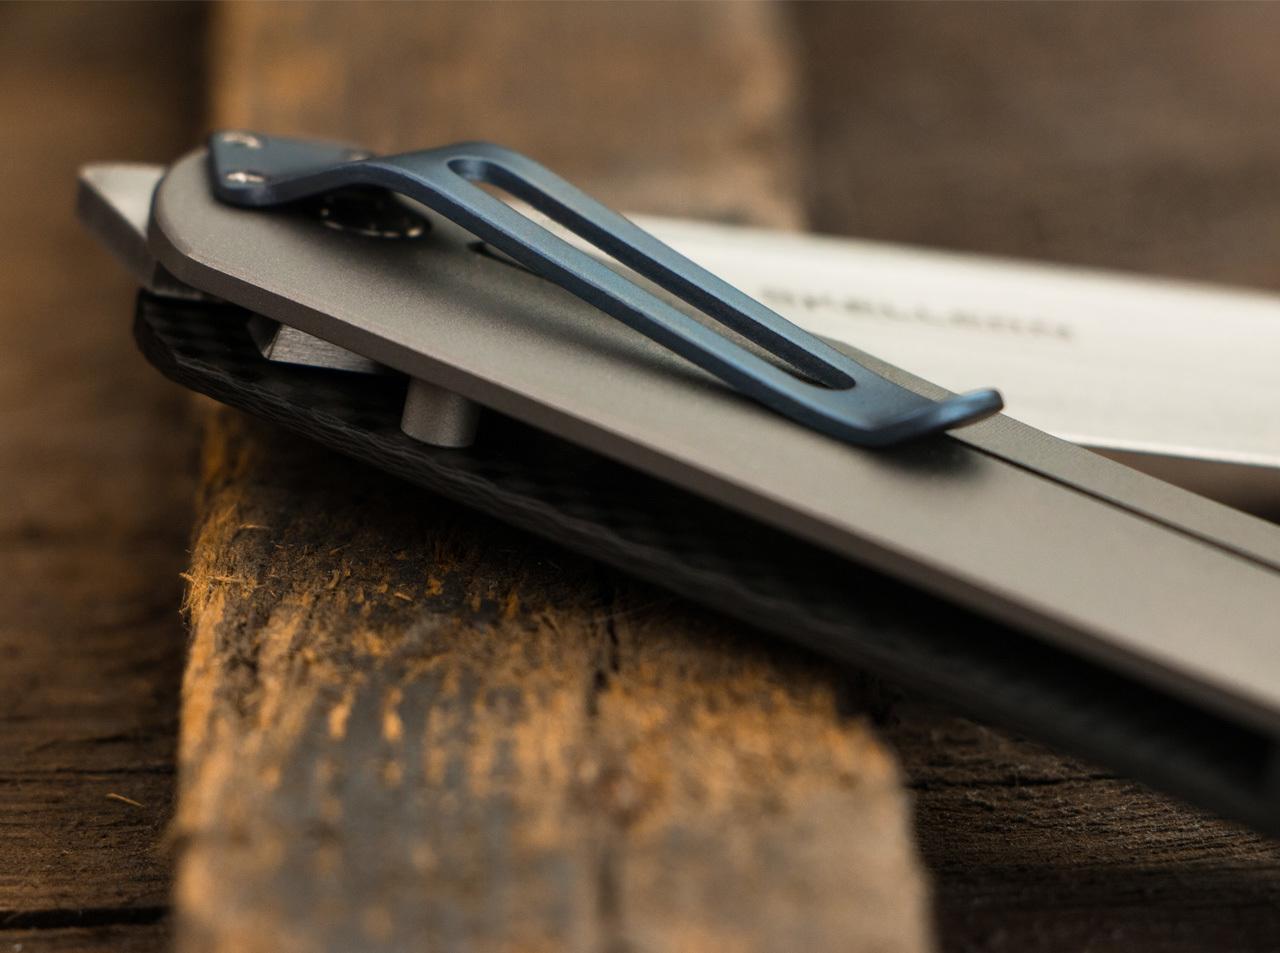 Фото 10 - Нож складной Exskelibur I Carbon Fiber, Titanium Frame Lock, сталь CPM-S35VN Satin Plain, рукоять карбон/титан, Boker Plus 01BO135